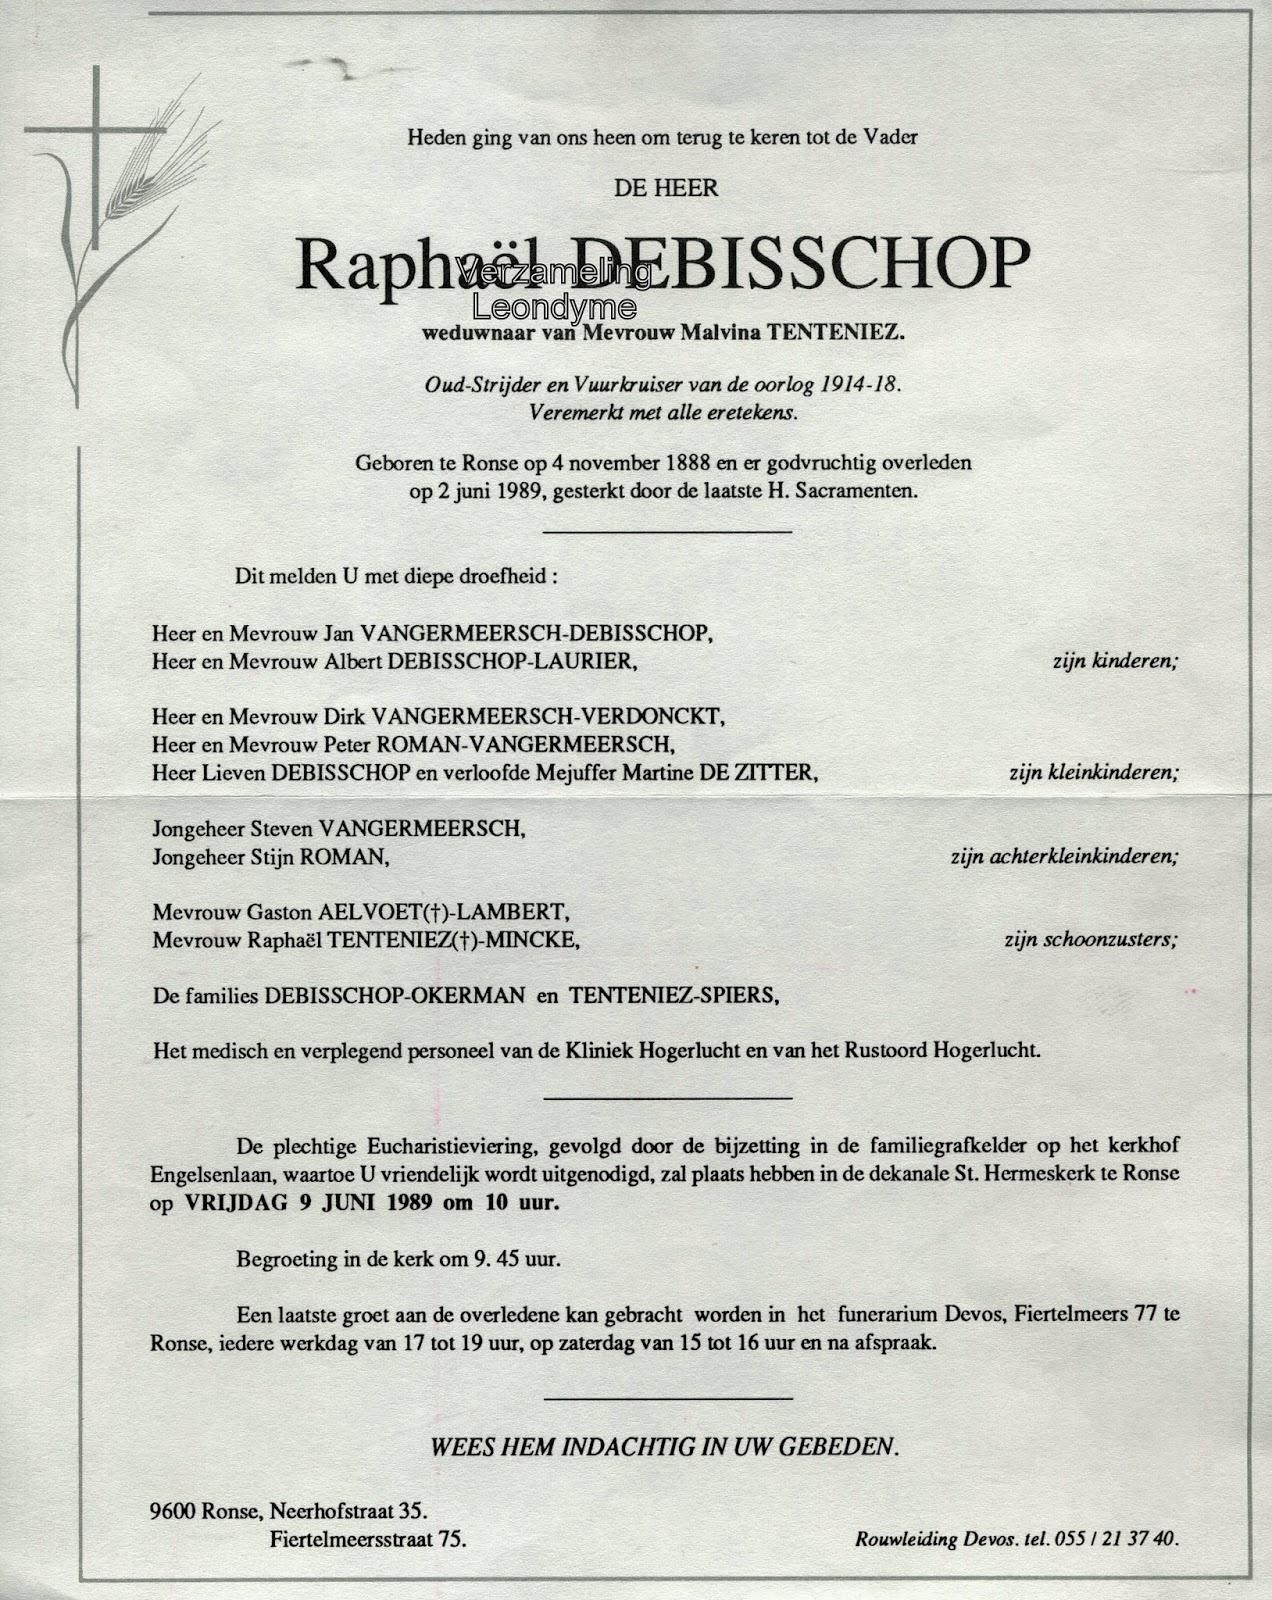 Rouwbrief, Raphaël Debisschop 1888-1989. Verzameling Leondyme